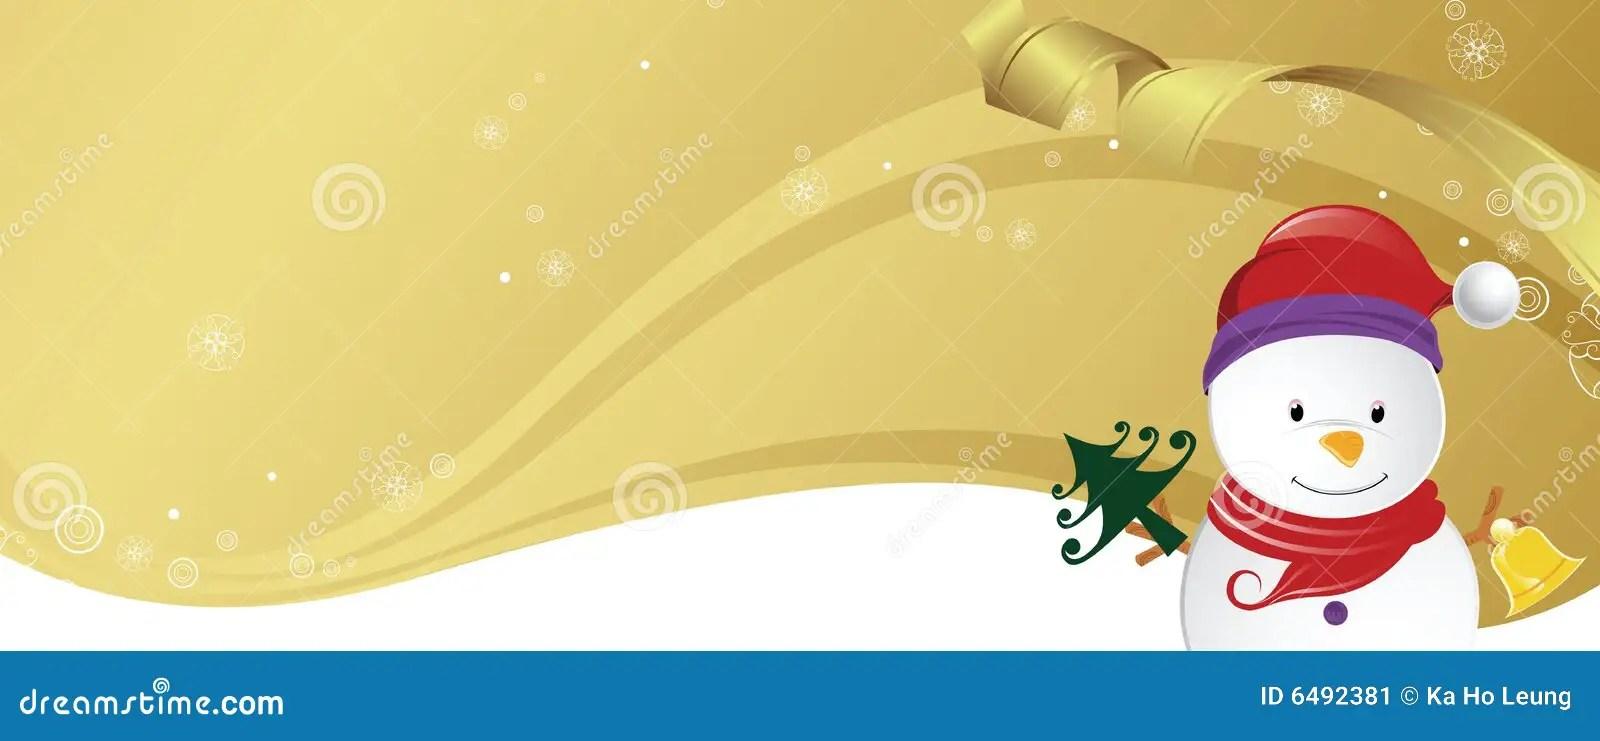 Christmas Party Invitation Card Stock Illustration Image